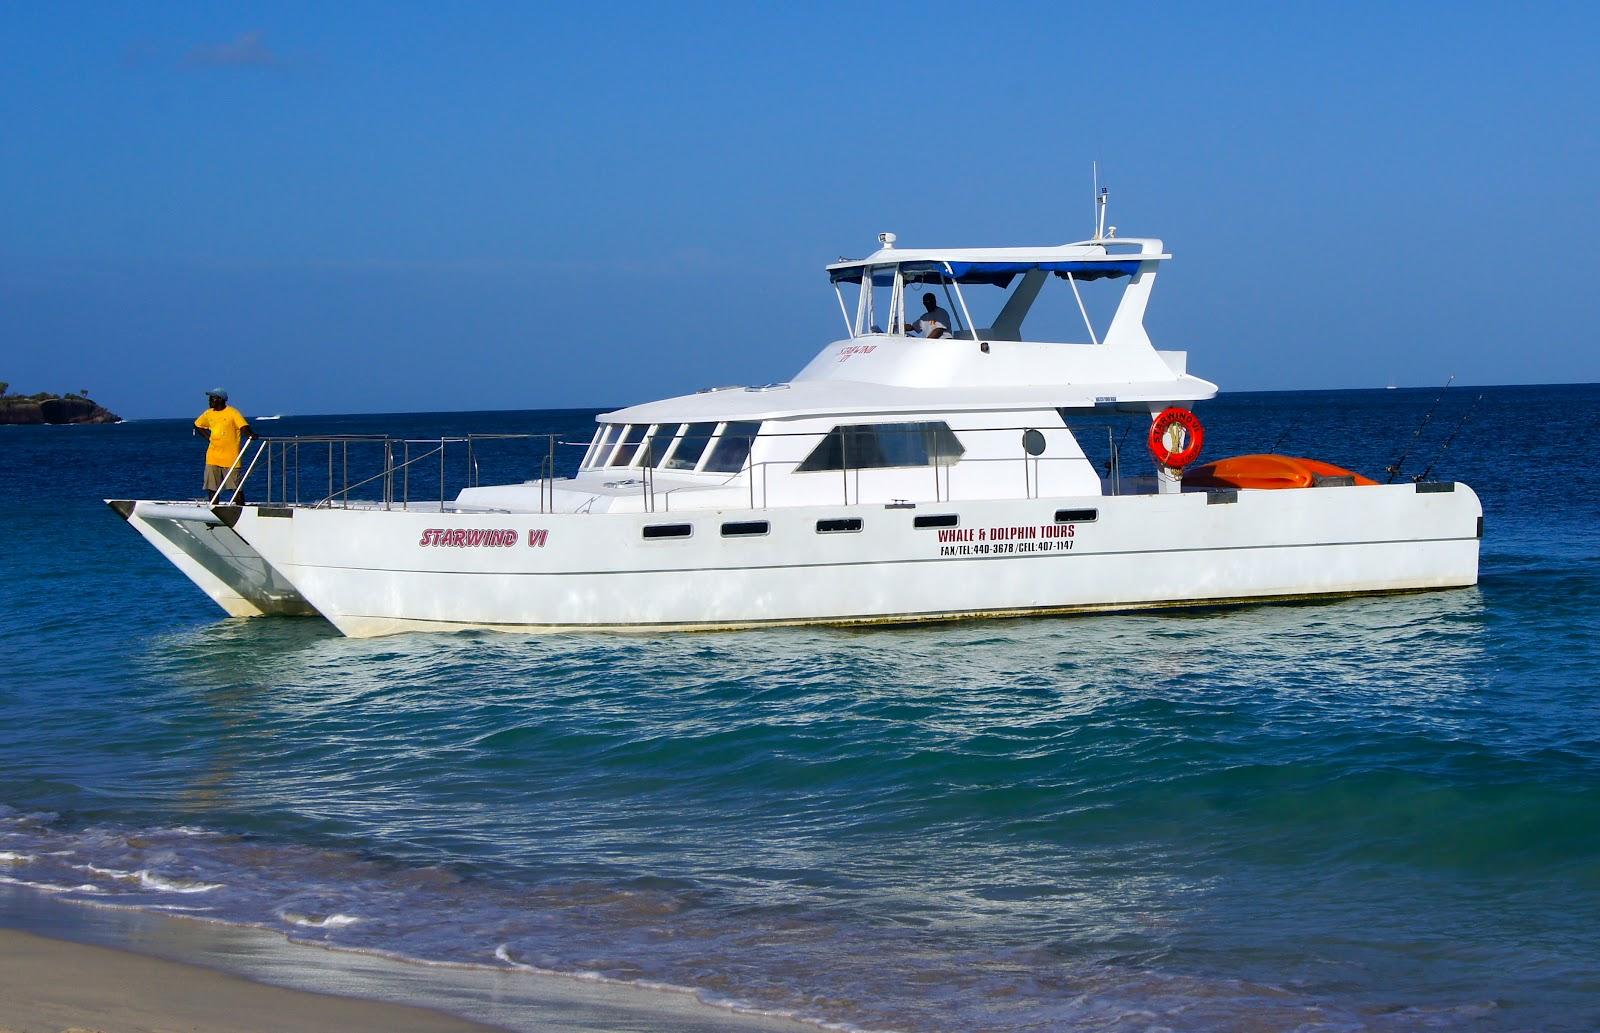 The stanley 39 s deep sea fishing for Deep sea fishing boat